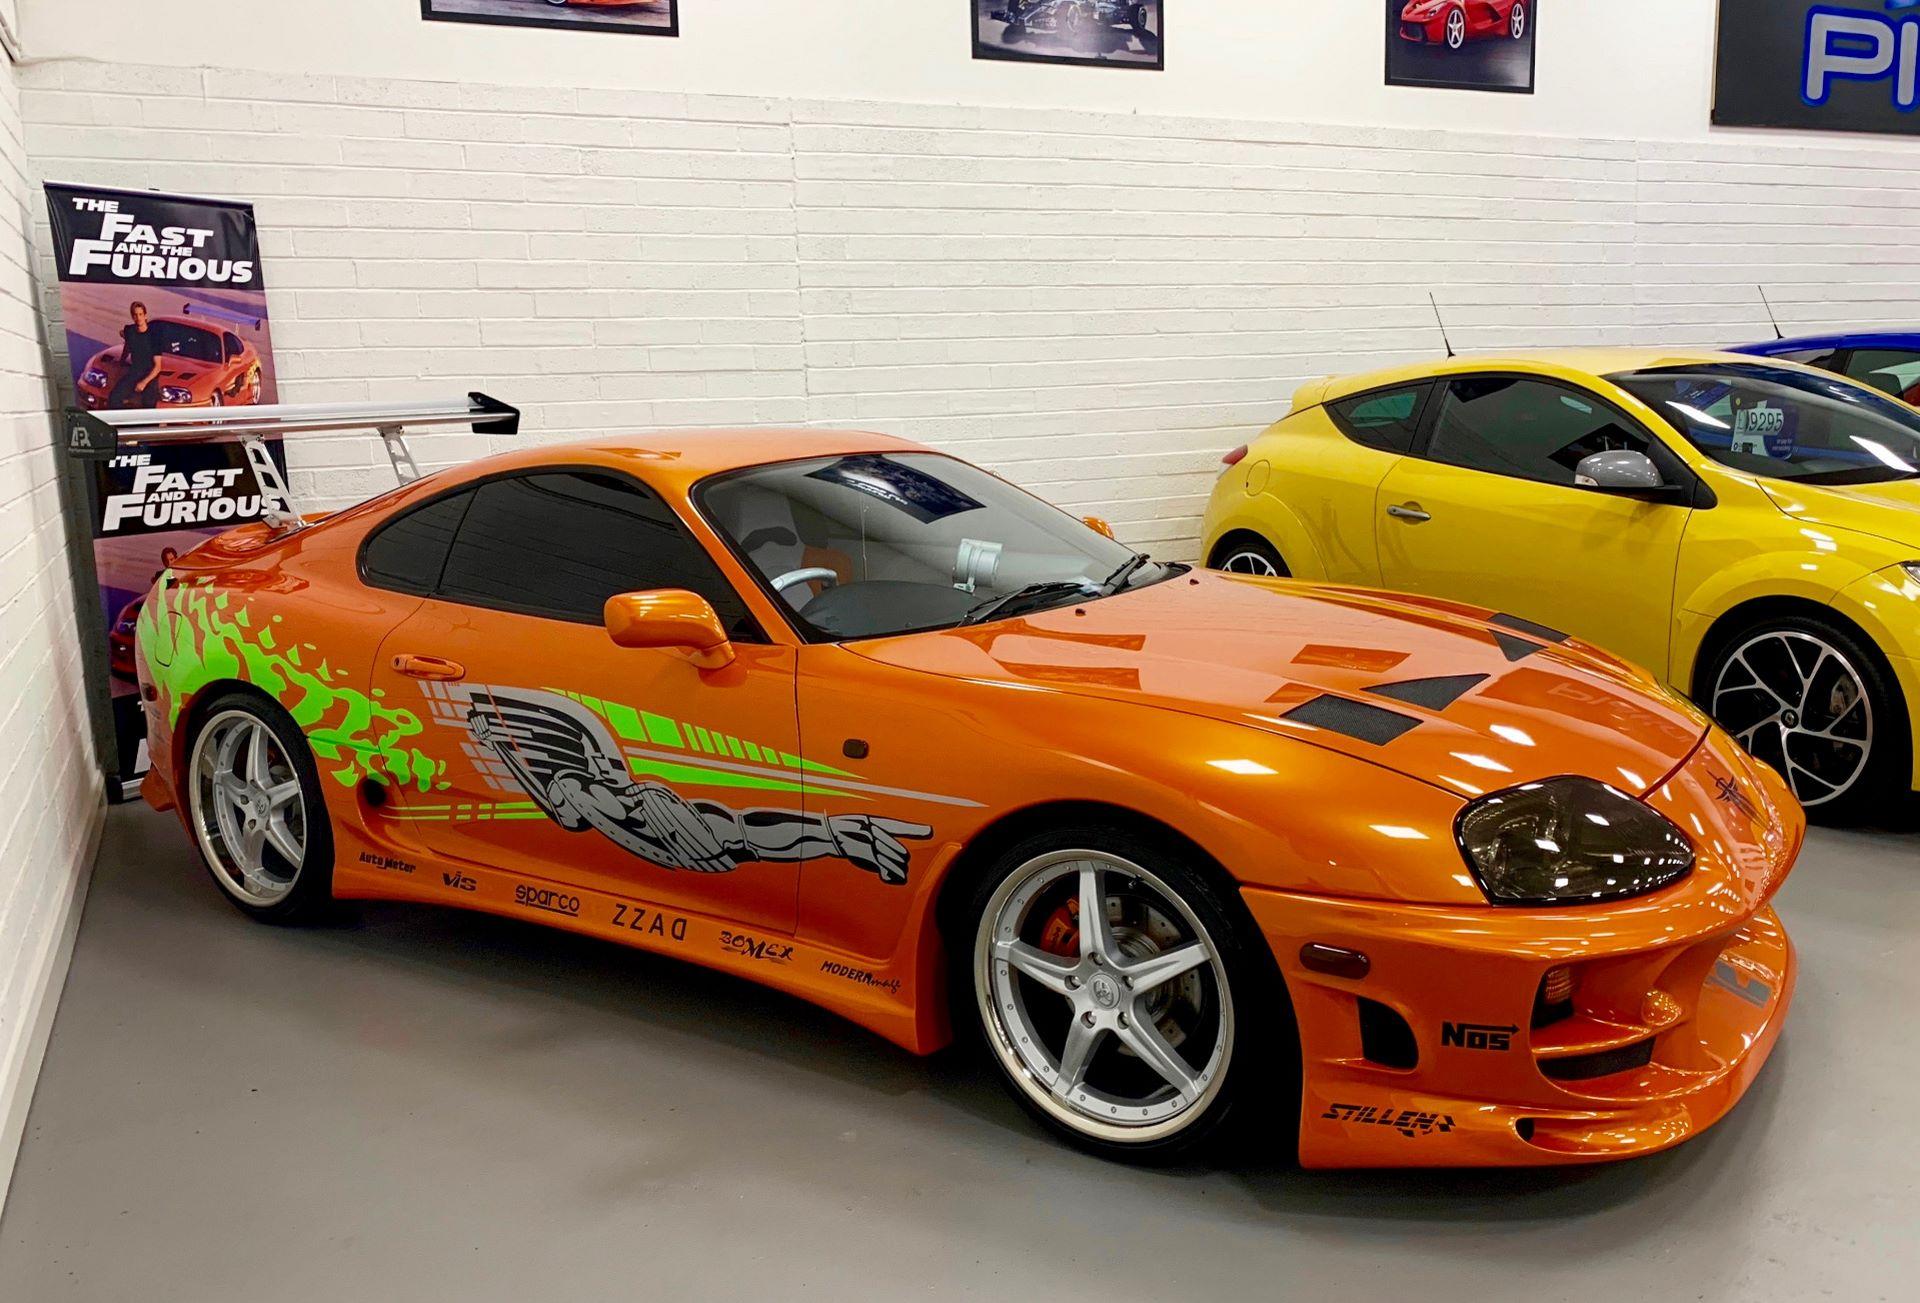 Toyota-Supra-replica-the-fast-and-the-furious-39